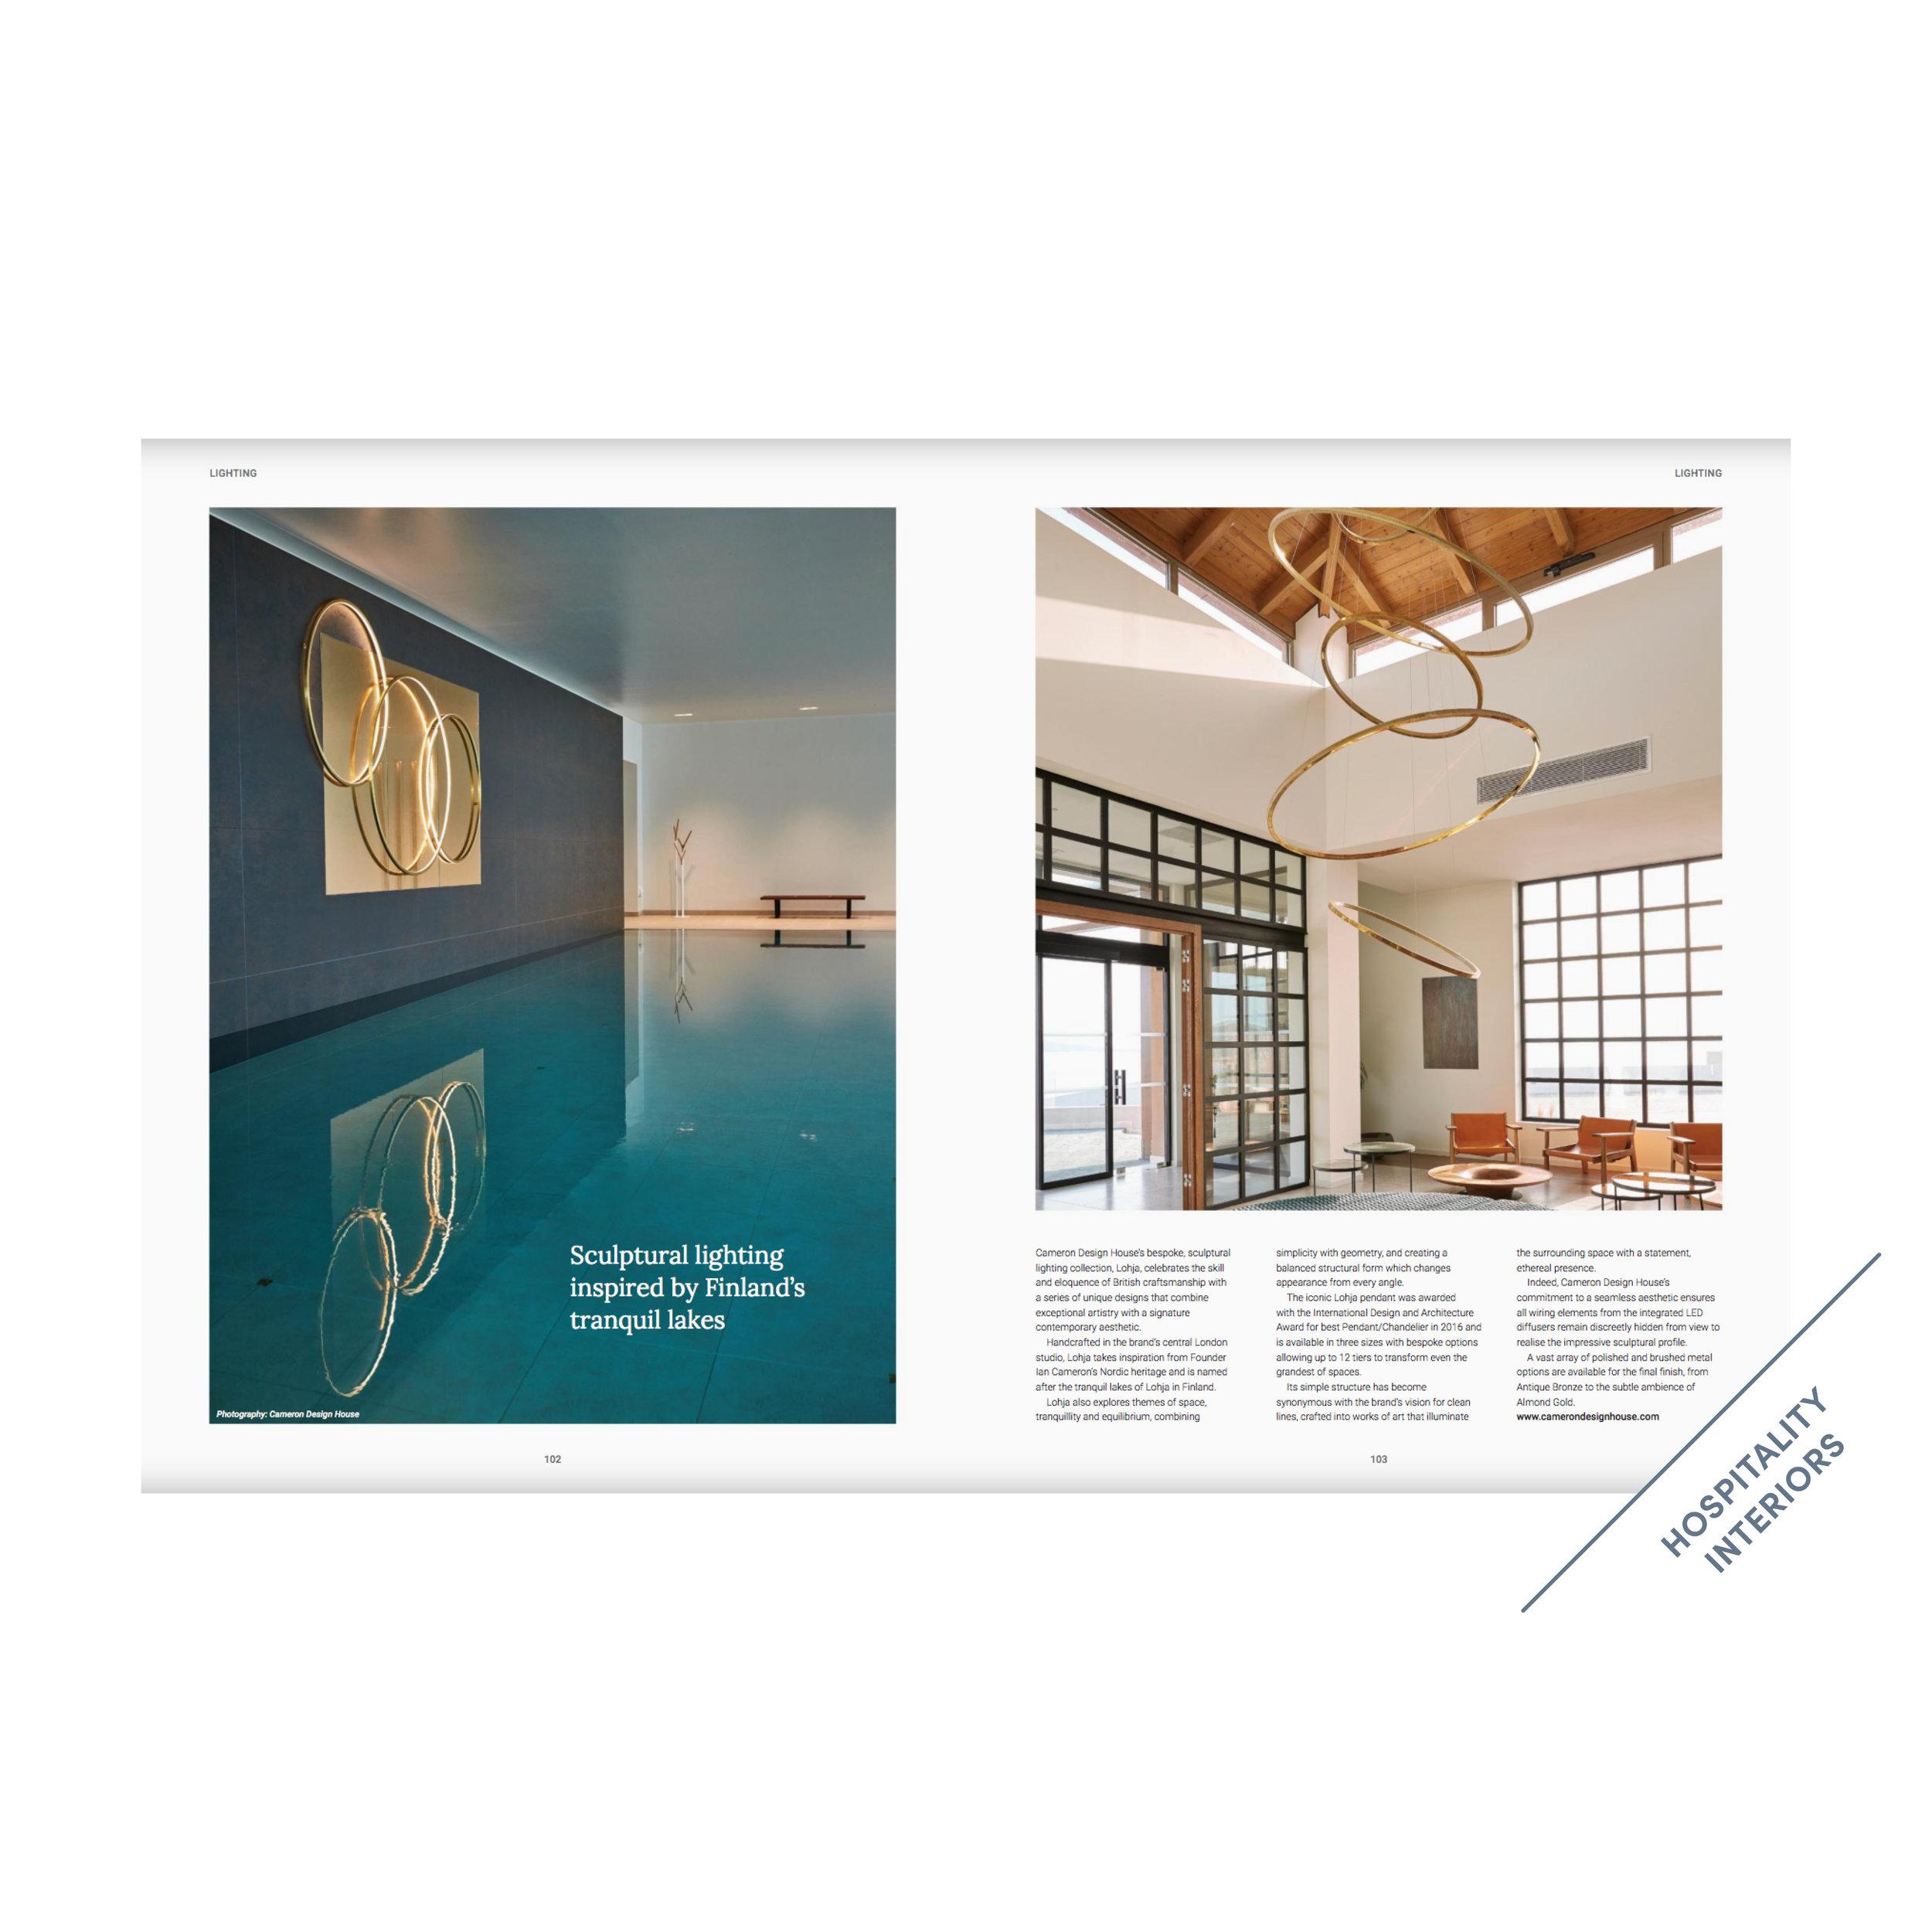 ITWR_interiors PR_Trade_5.jpg